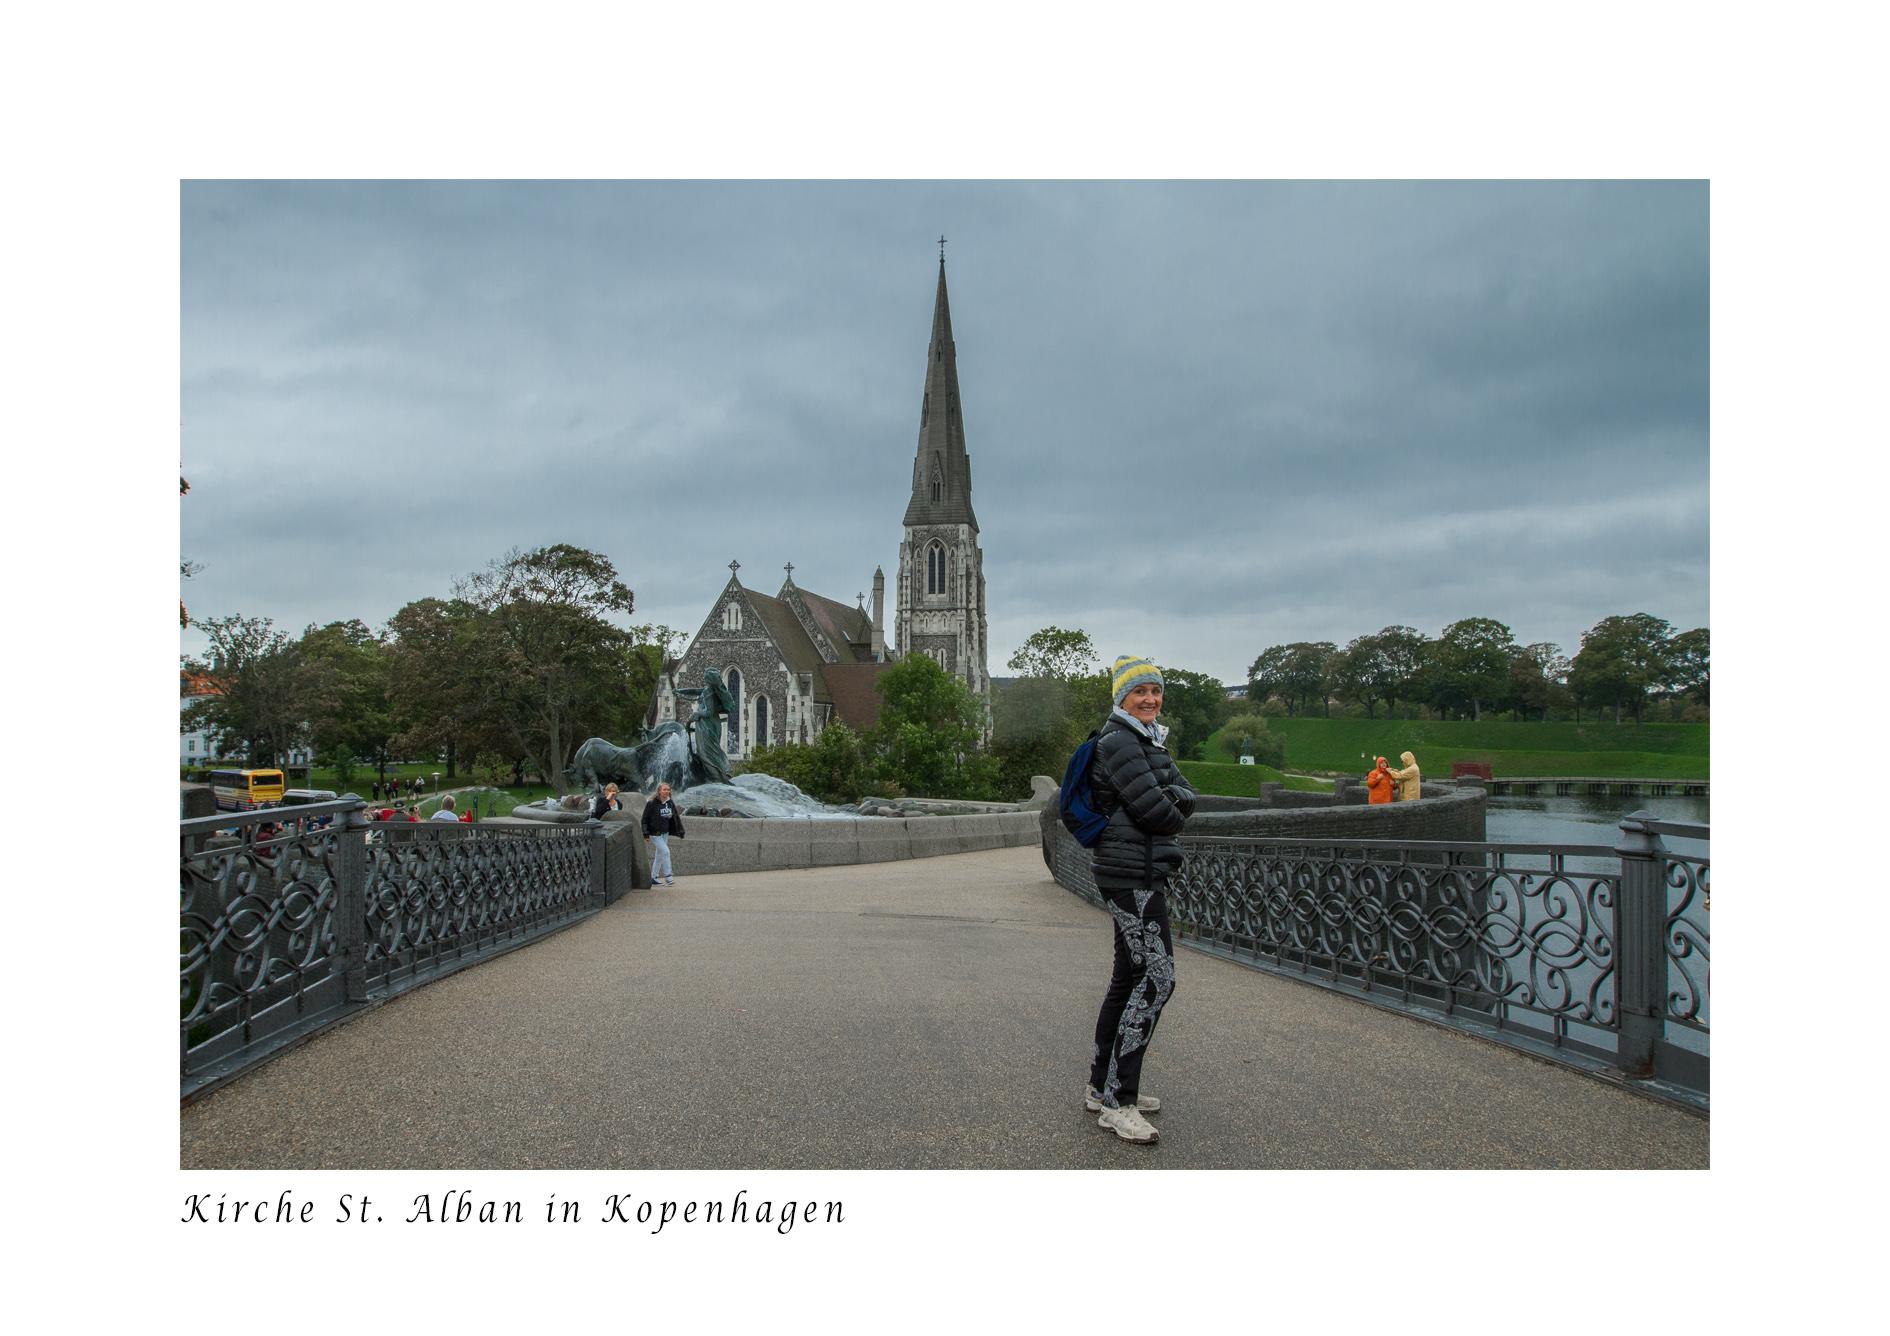 Kirche St. Alban in Kopenhagen